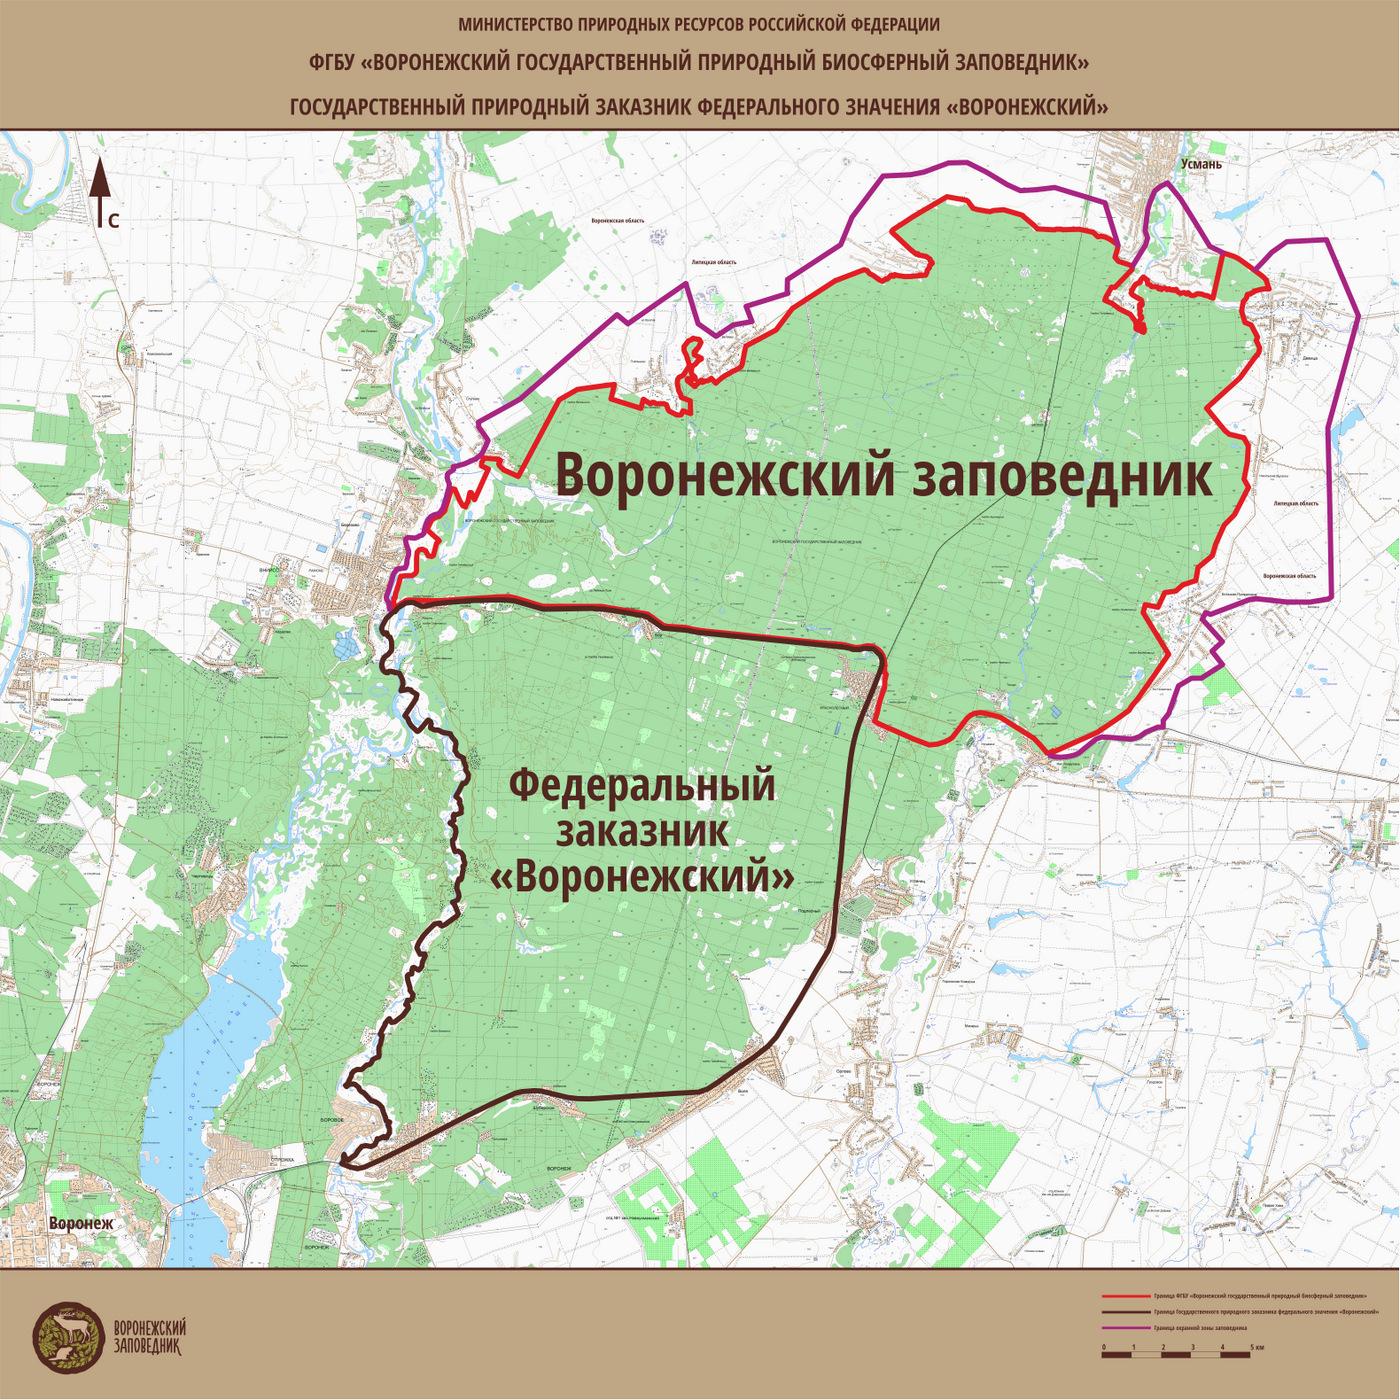 Доклад о воронежском государственном заповеднике 6164